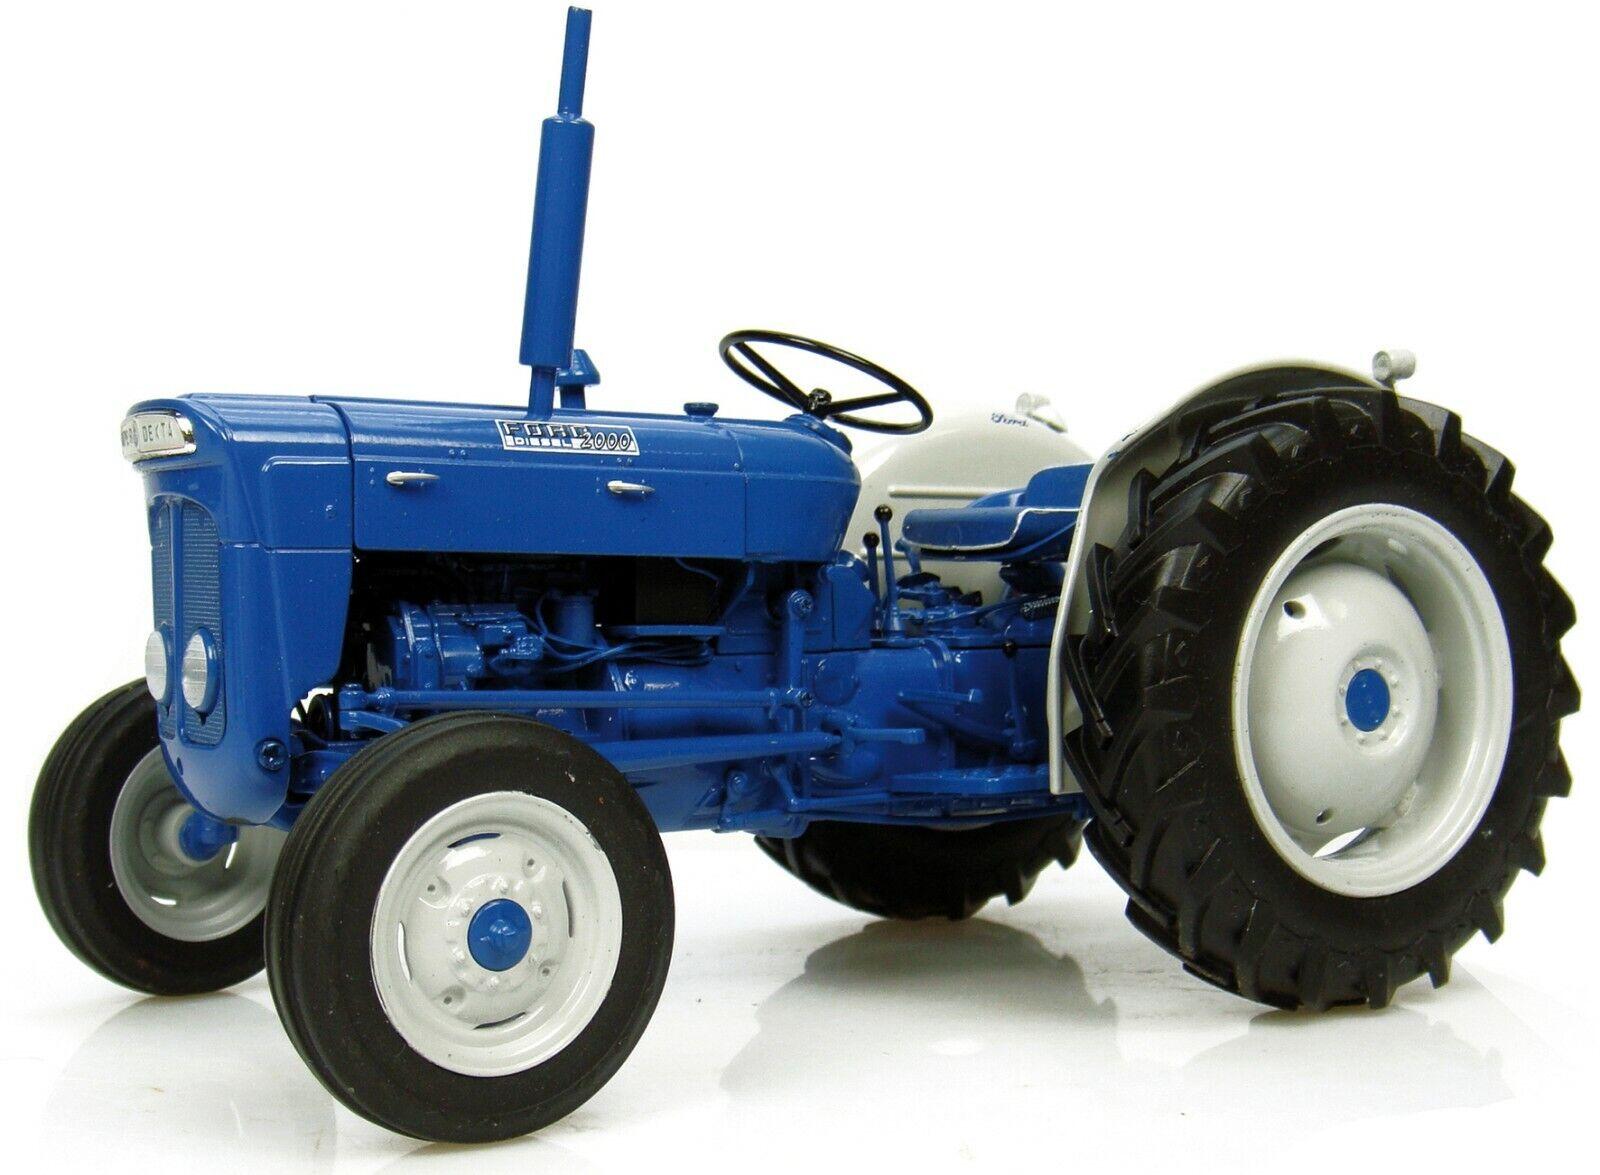 Fordson Super Dexta Diesel 2000 Traktor U.S.Version 1 16 Universal Hobbies